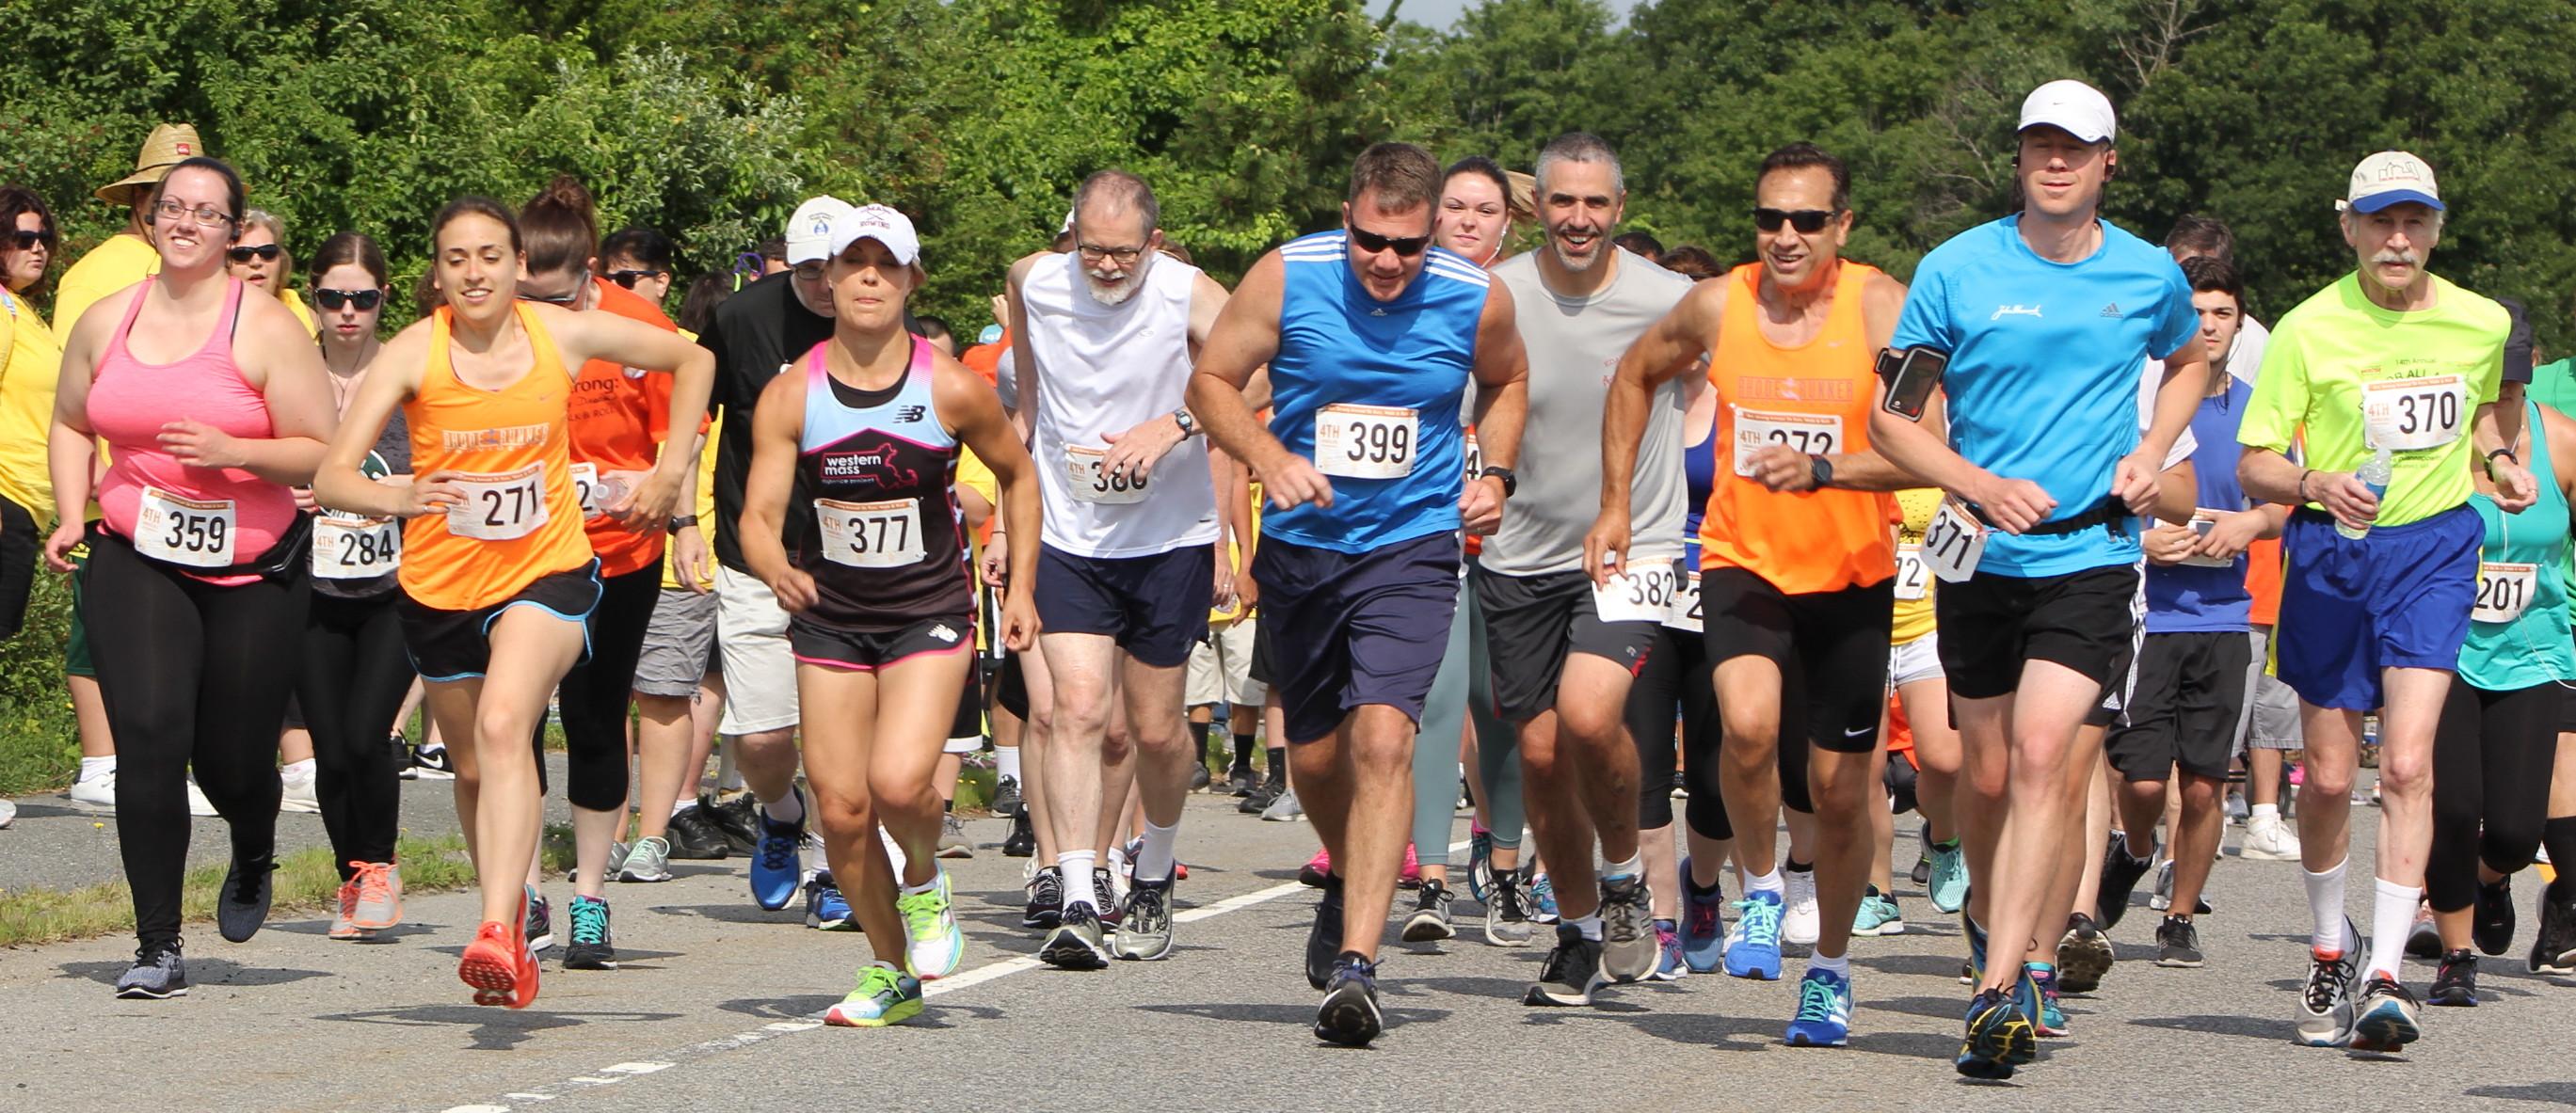 Arc Strong: Achieving Dreams 5K Run, Walk & Roll